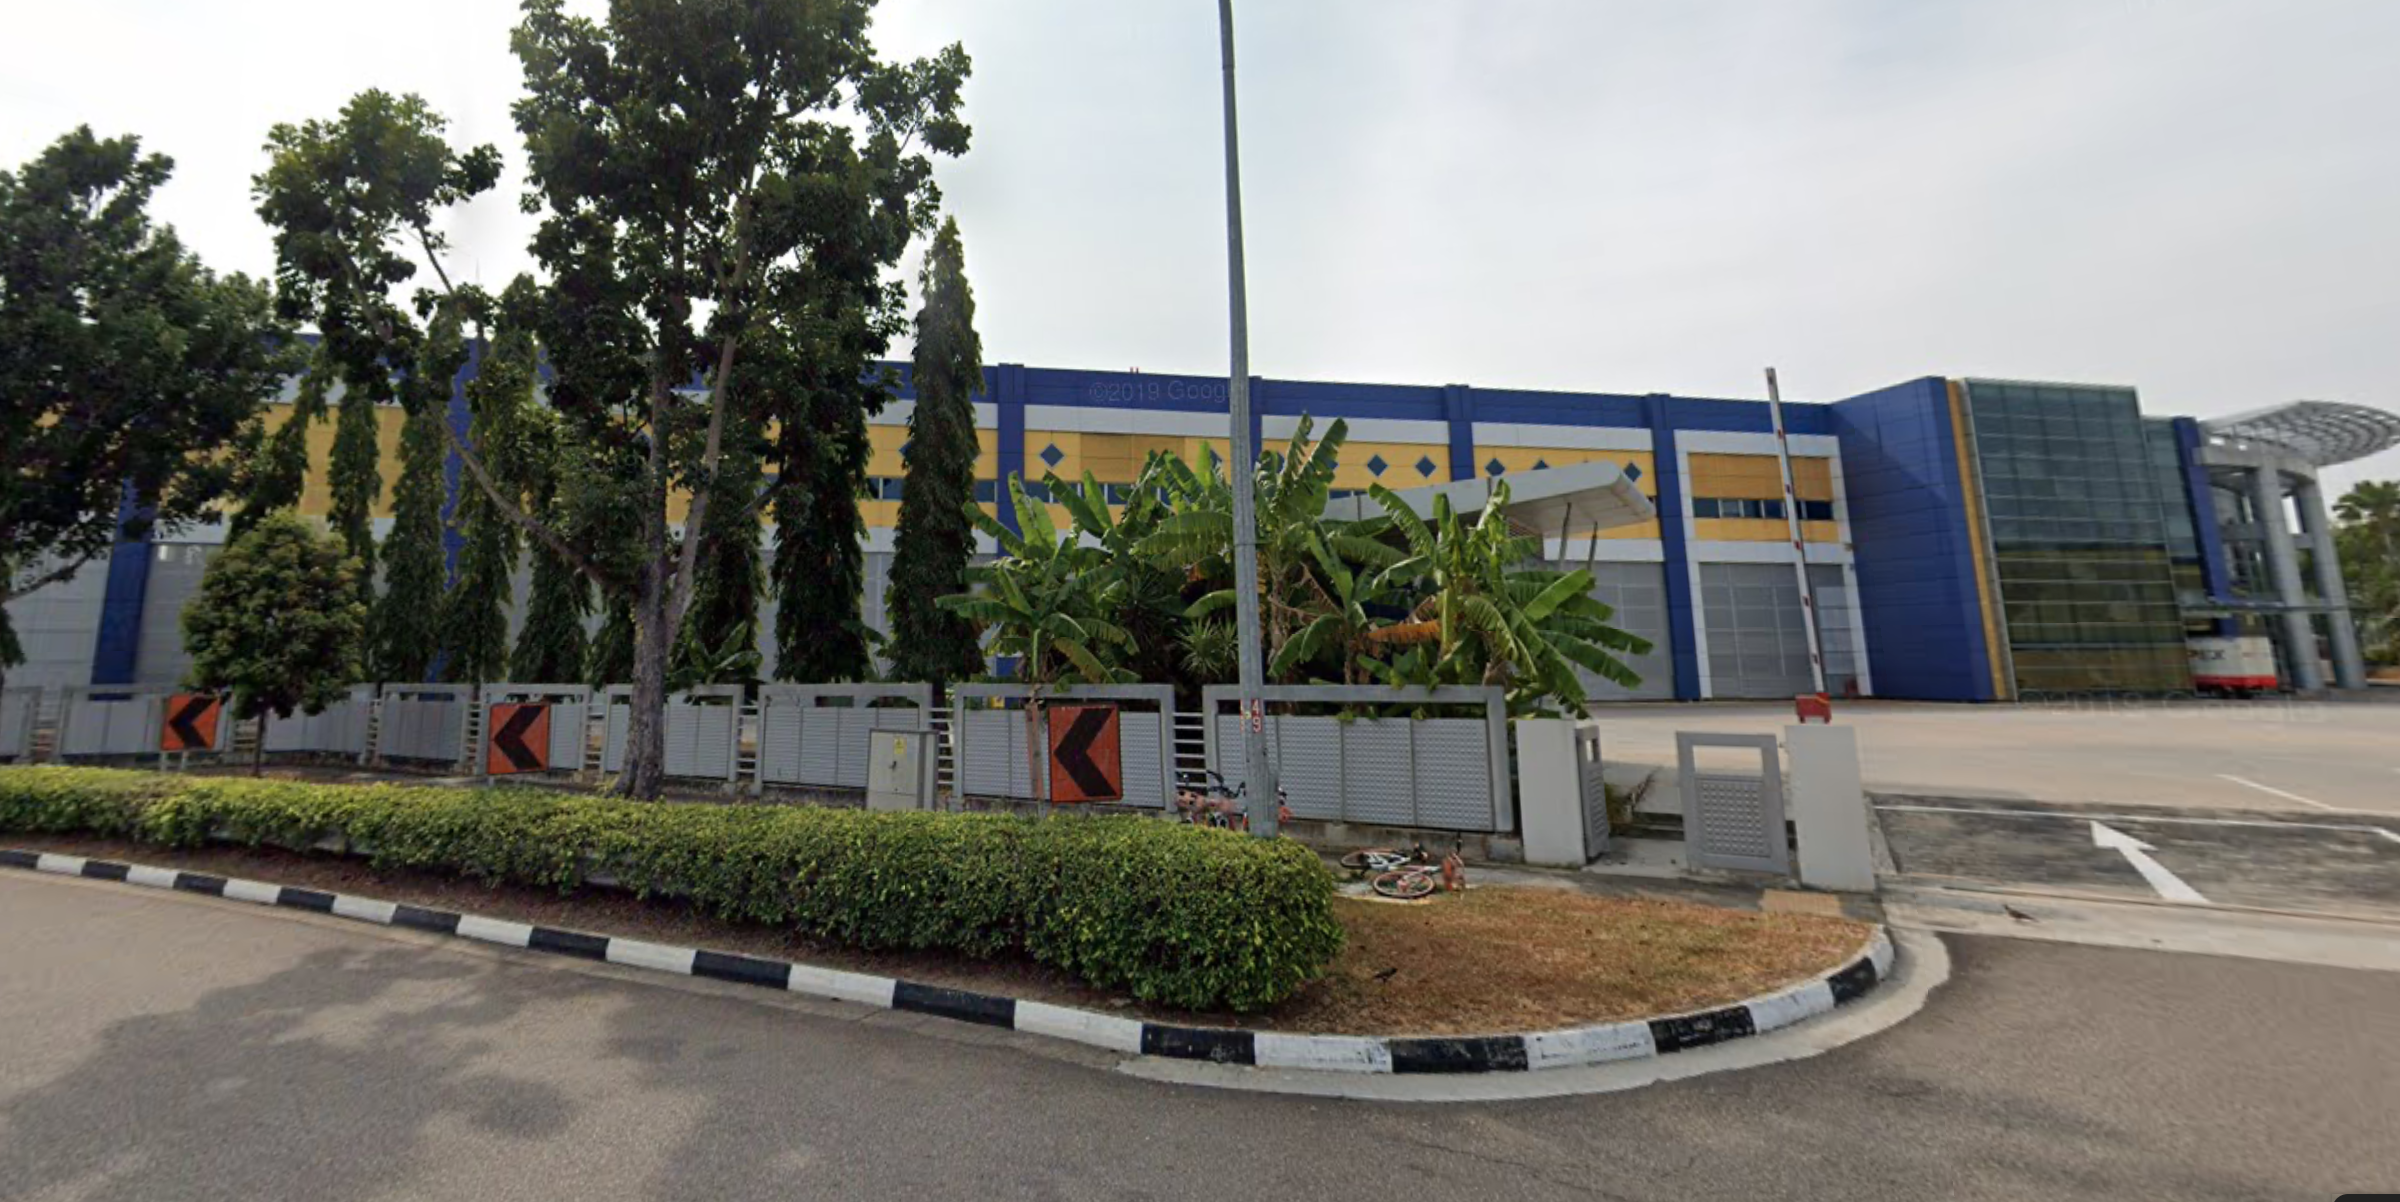 25 Changi South Street 1 (Google Maps)